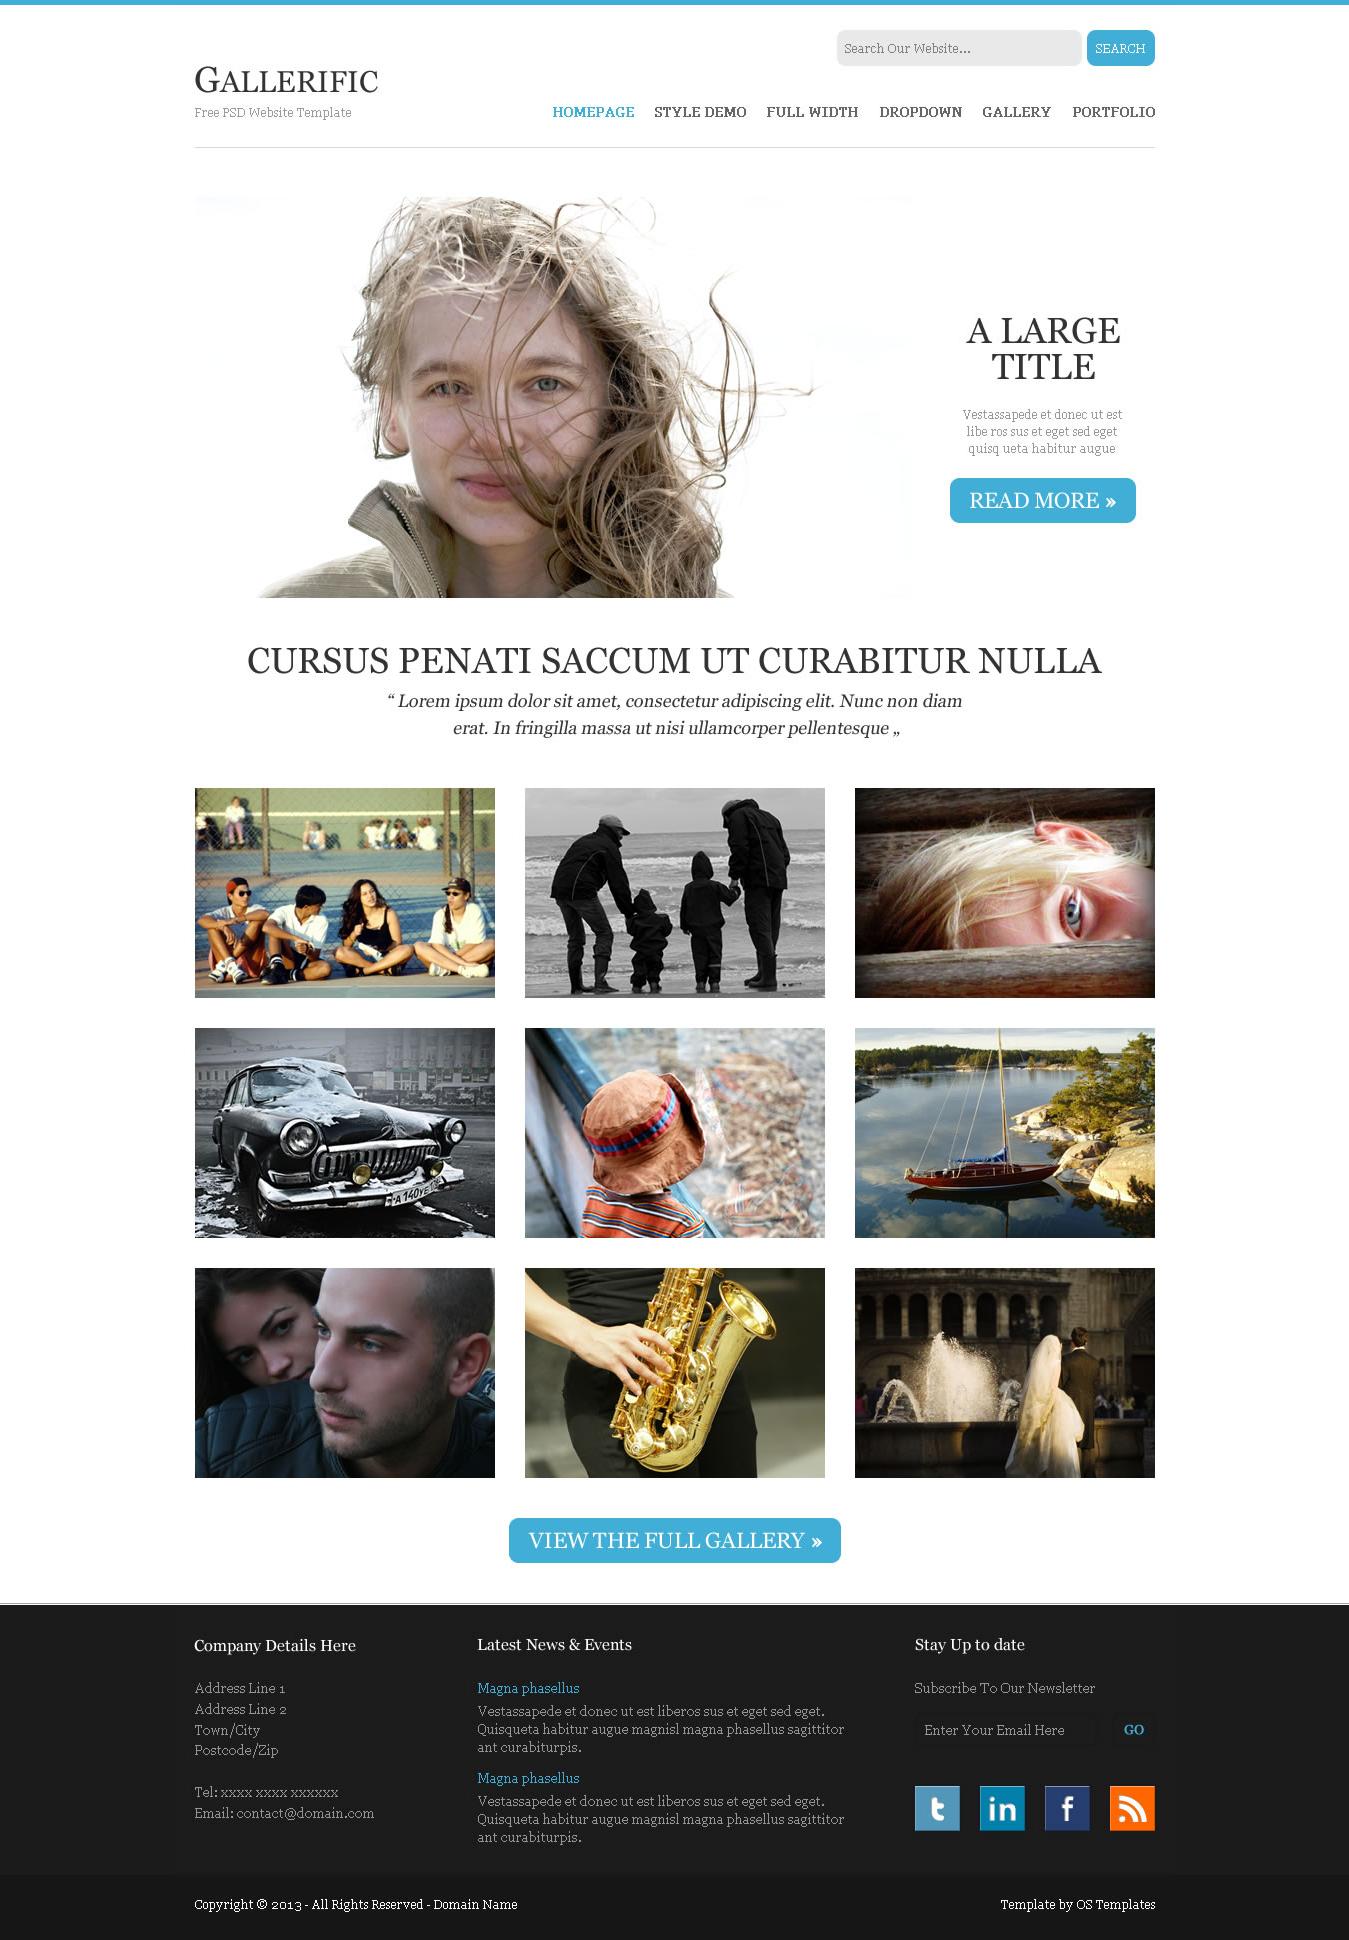 Plantillas psd portfolio (Photoshop) - recursos WEB & SEO